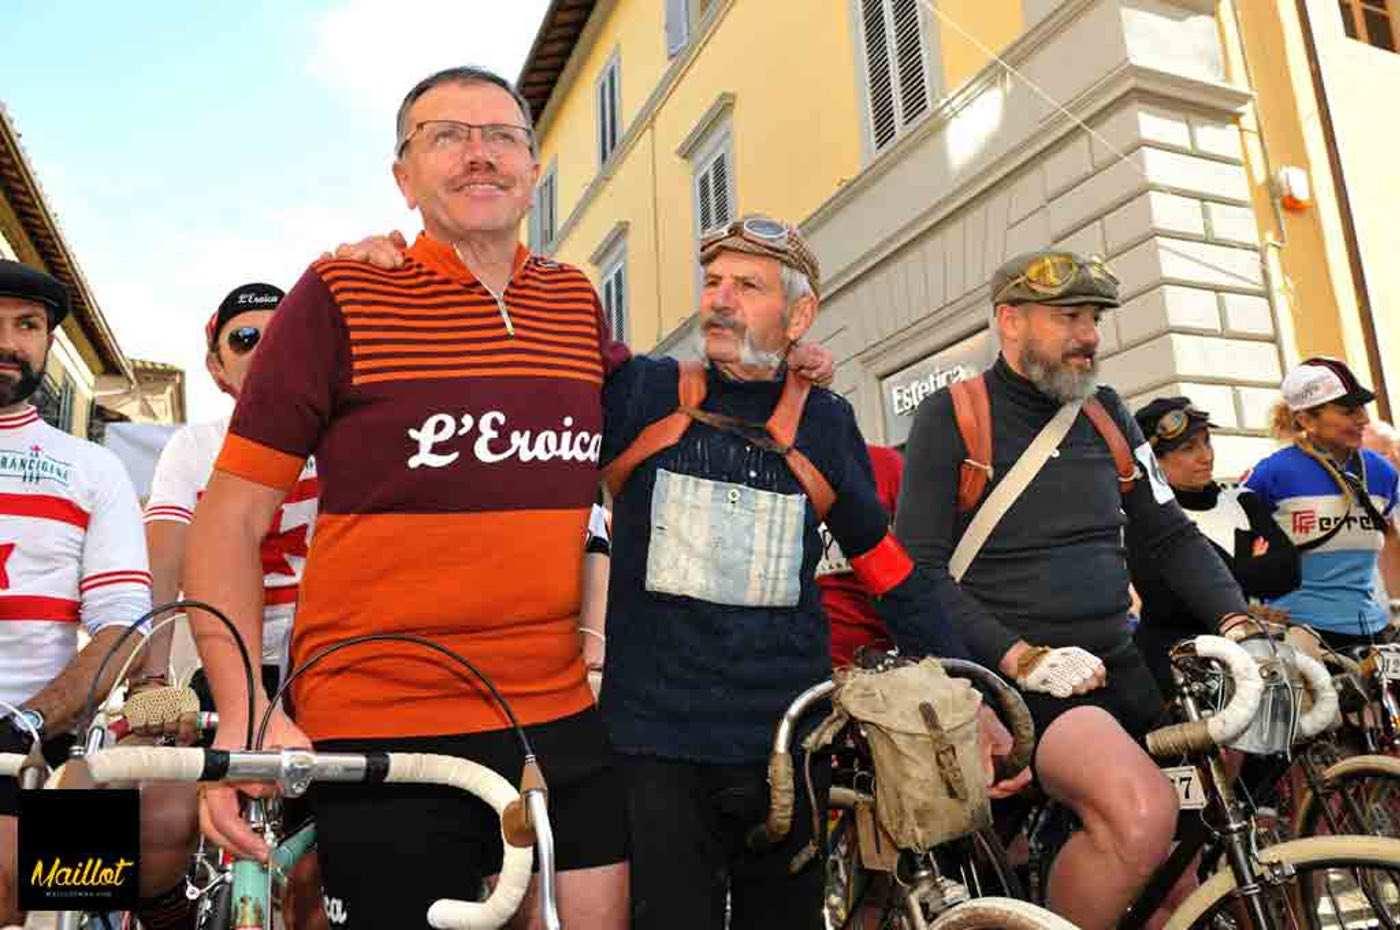 Bianchi celebra el aniversario de L'eroica